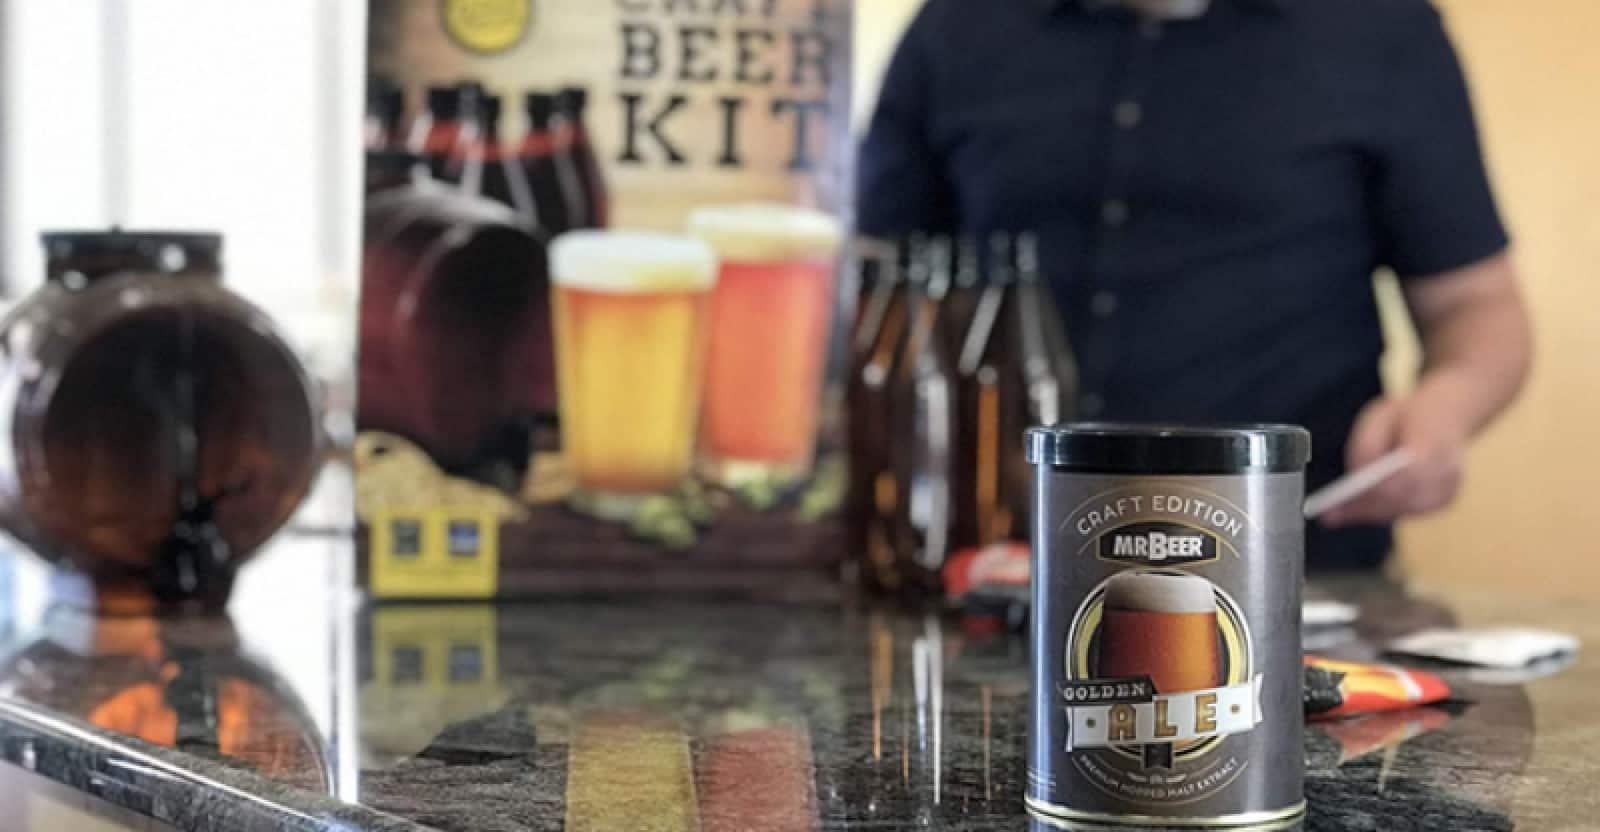 Mr. Beer Kit Review